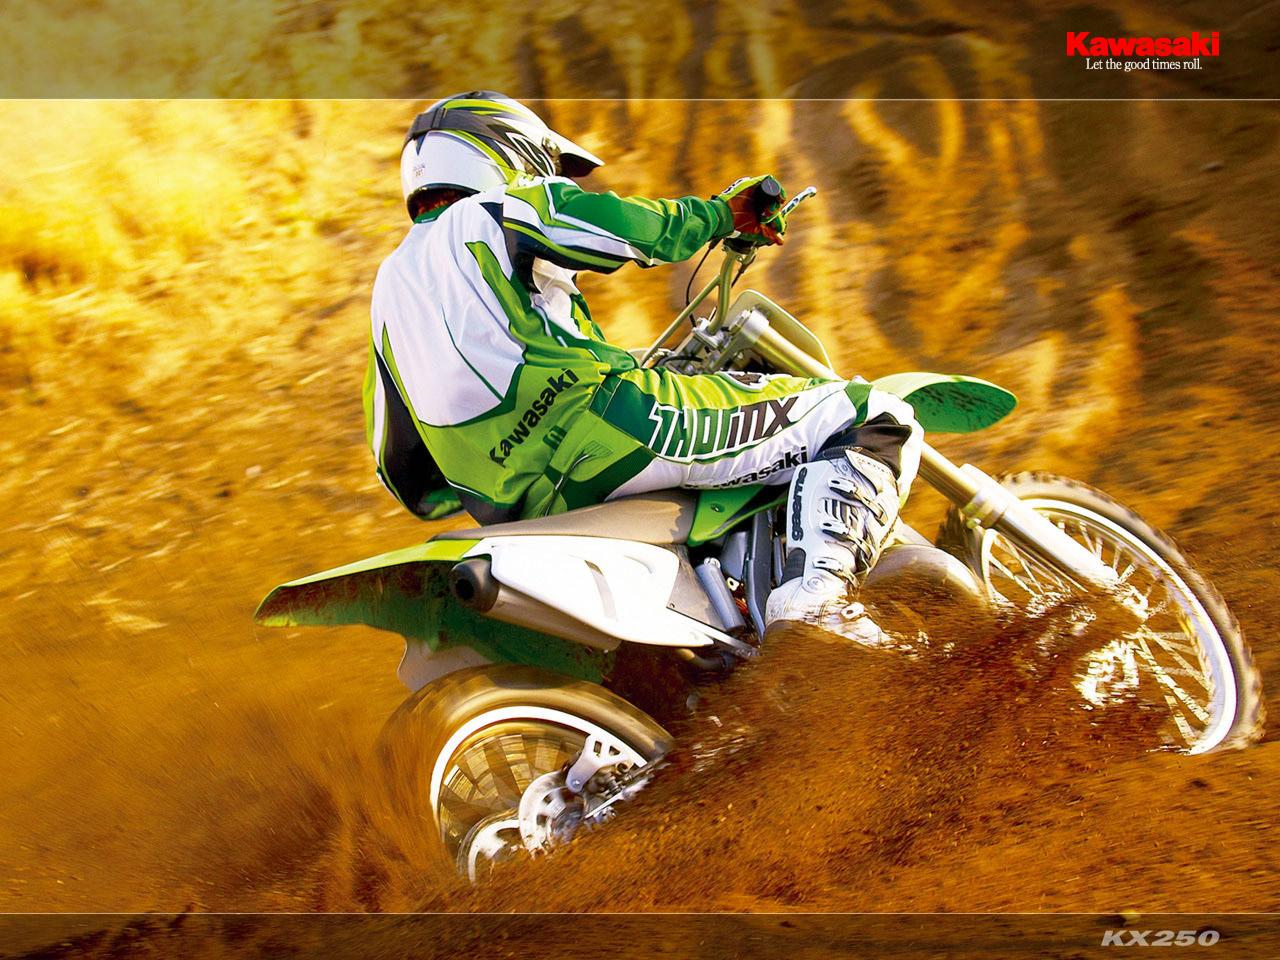 http://1.bp.blogspot.com/_v8zVVmiv4DY/TOPeWKMpHYI/AAAAAAAAAAQ/HXjWHcxg2Sw/s1600/Kawasaki-KX-250-Motocross-Bike.jpg